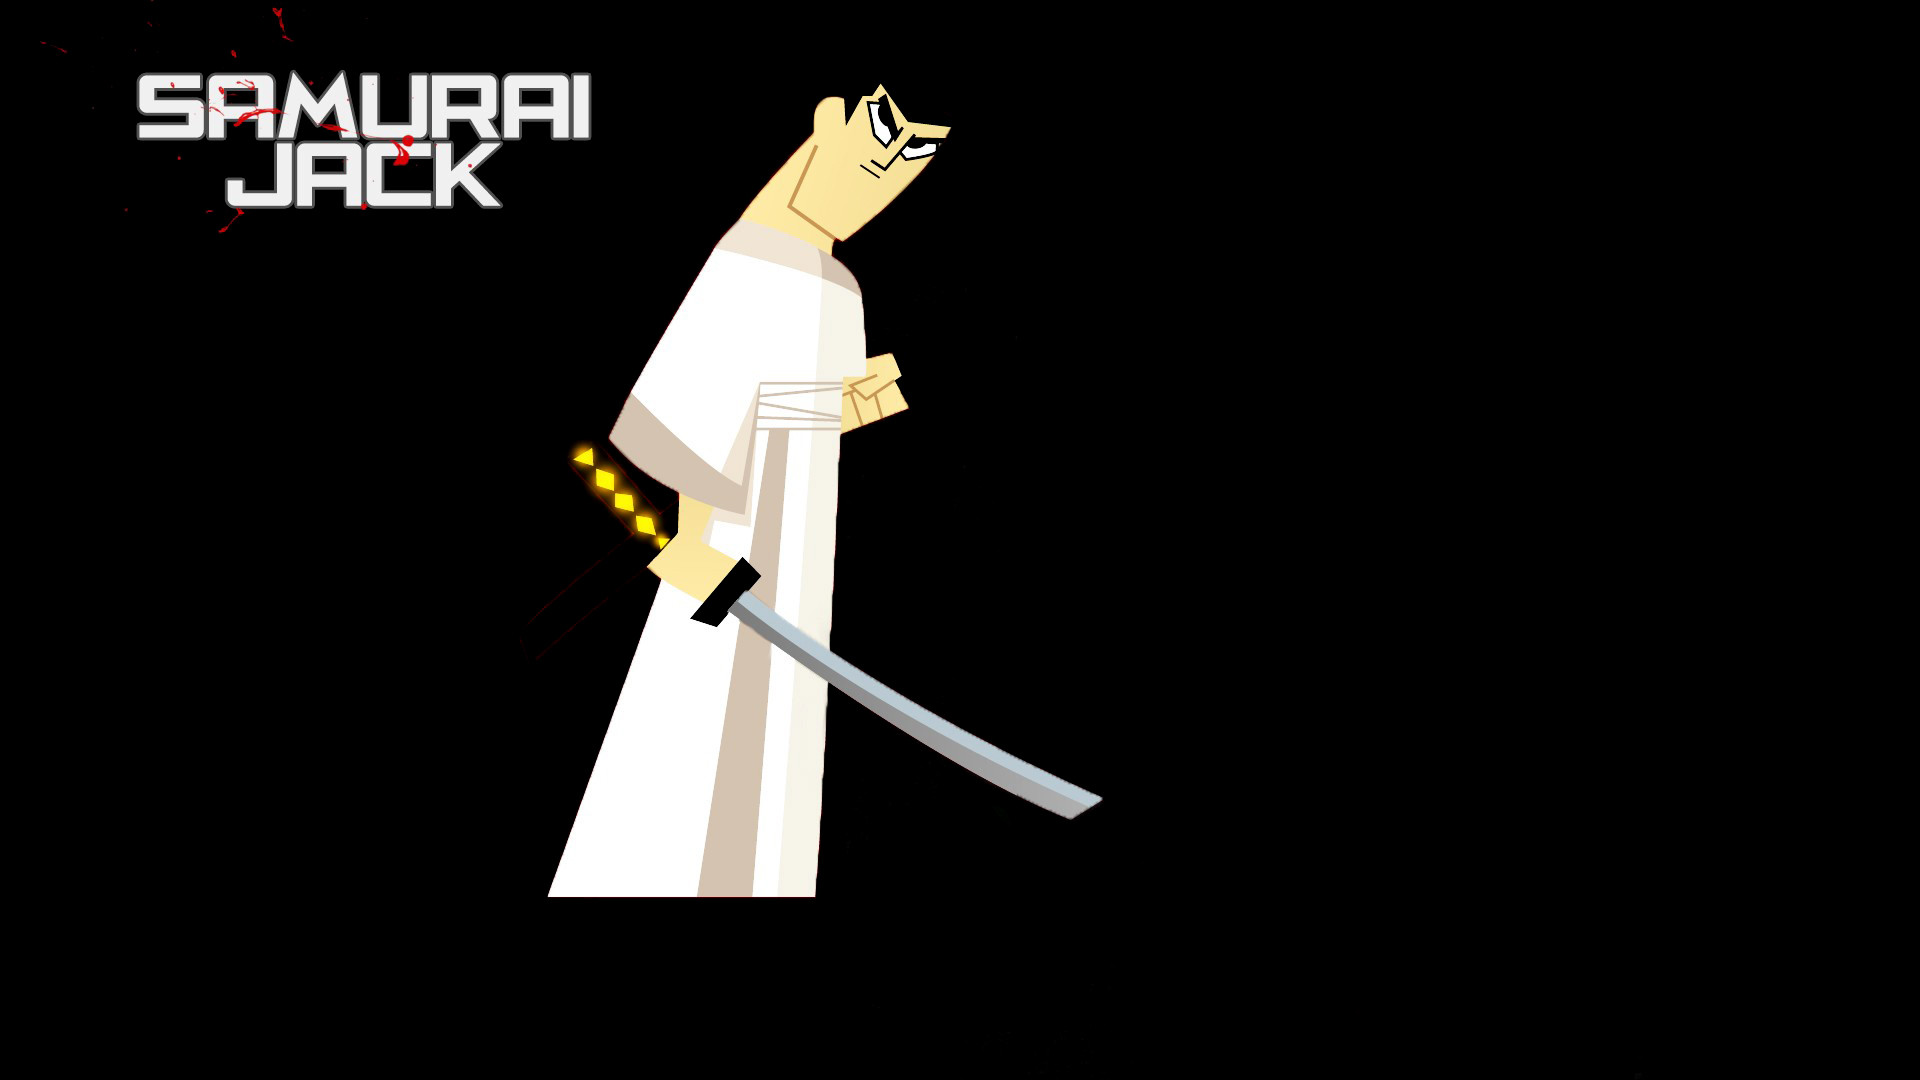 Courage The Cowardly Dog Cartoons · cartoon network cartoons samurai jack  Cartoon Network Cartoons Samurai Jack